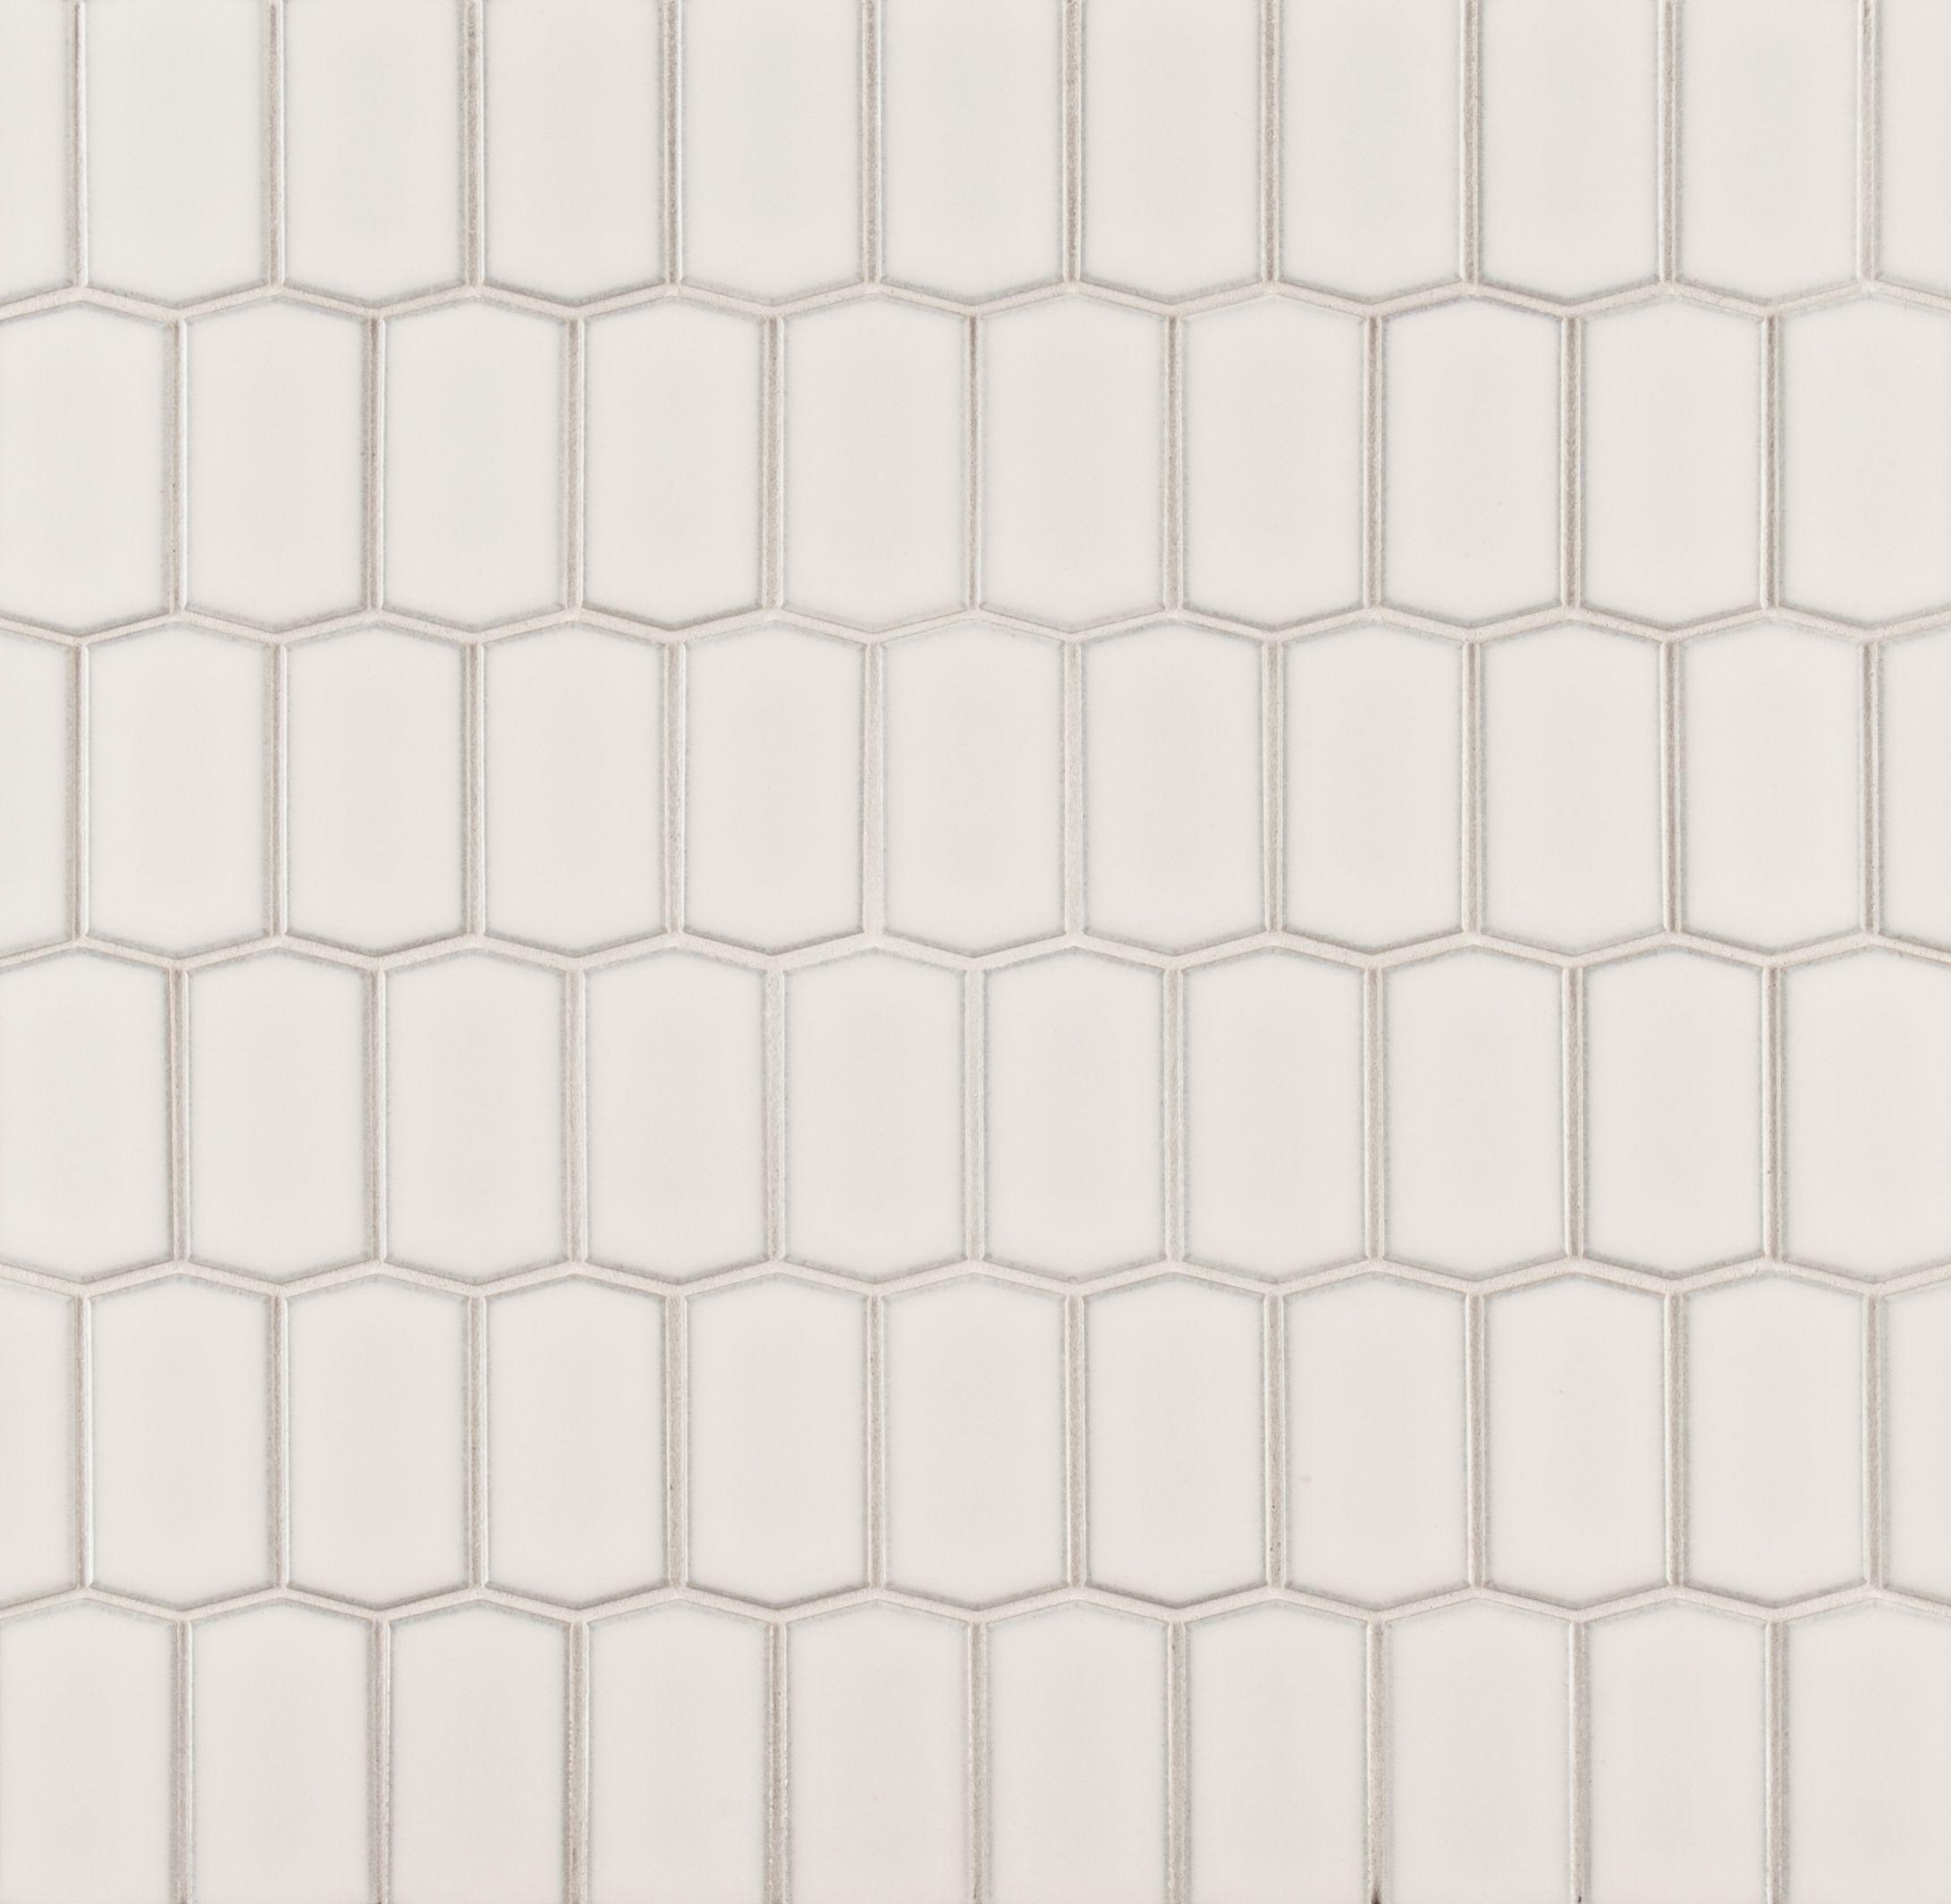 Ann Sacks Savoy Hive Ceramic Mosaic In Ricepaper Let S Do